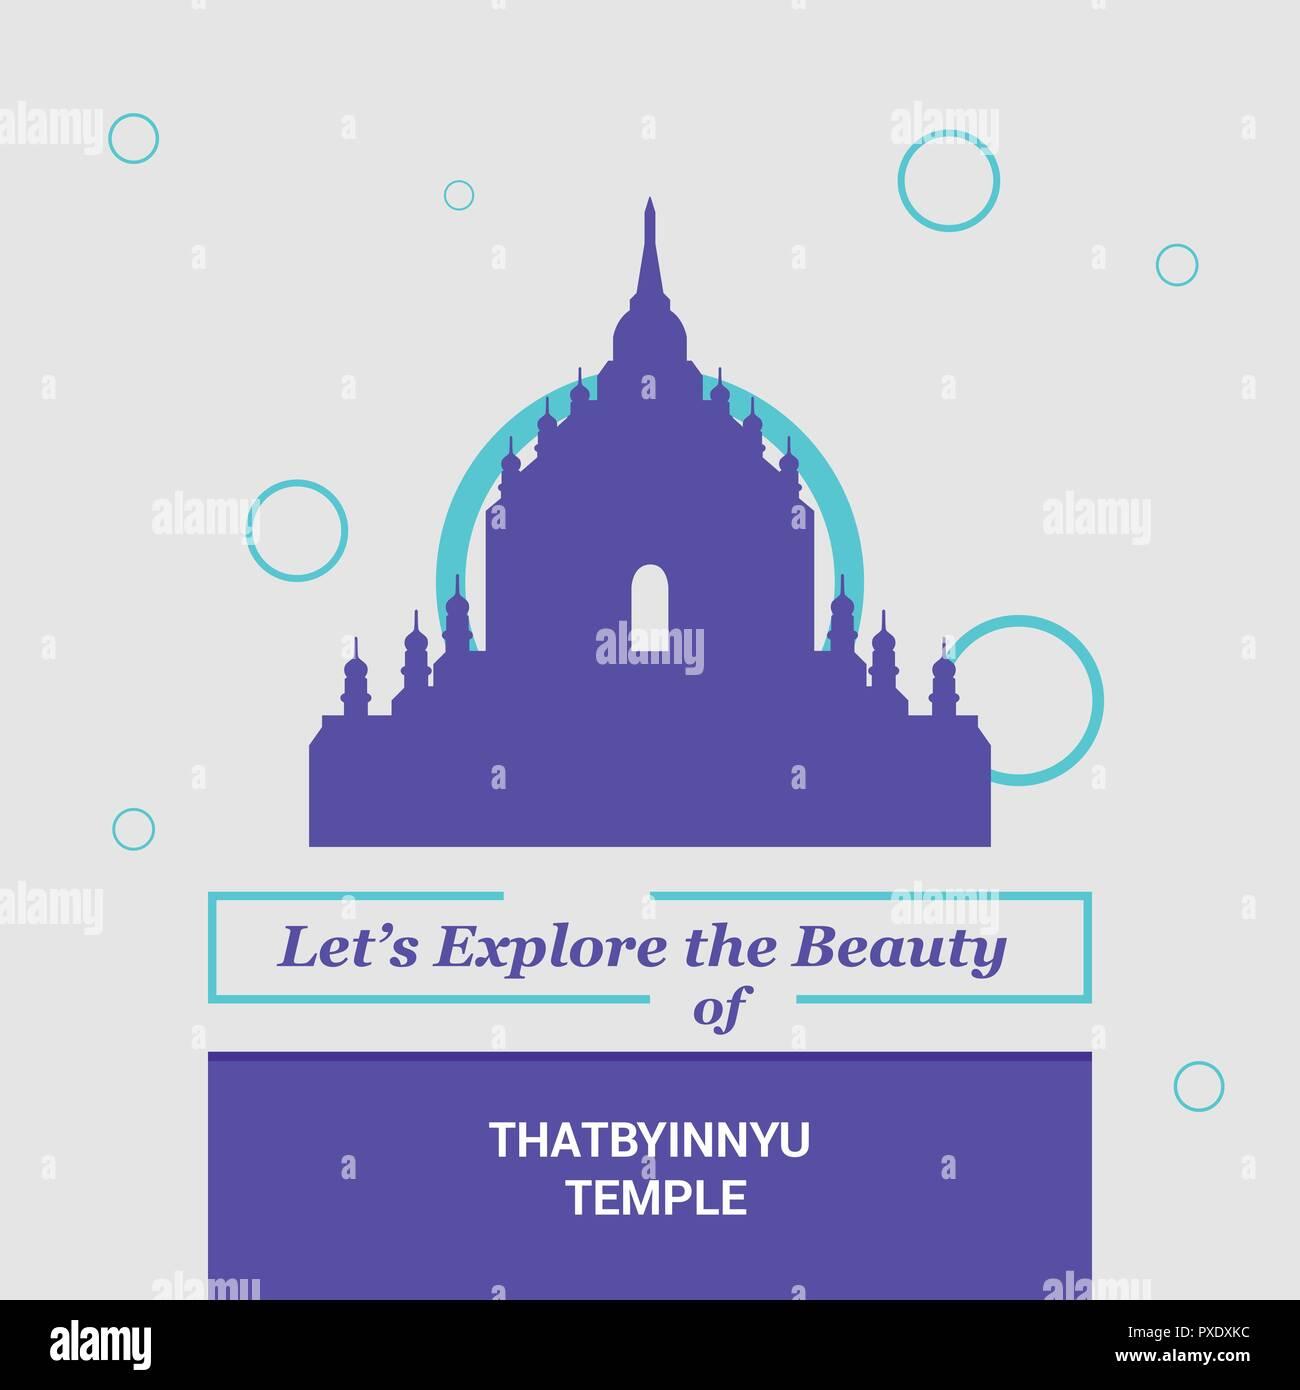 Let's Explore the beauty of Thatbyinnyu Temple, Myanmar National Landmarks - Stock Vector